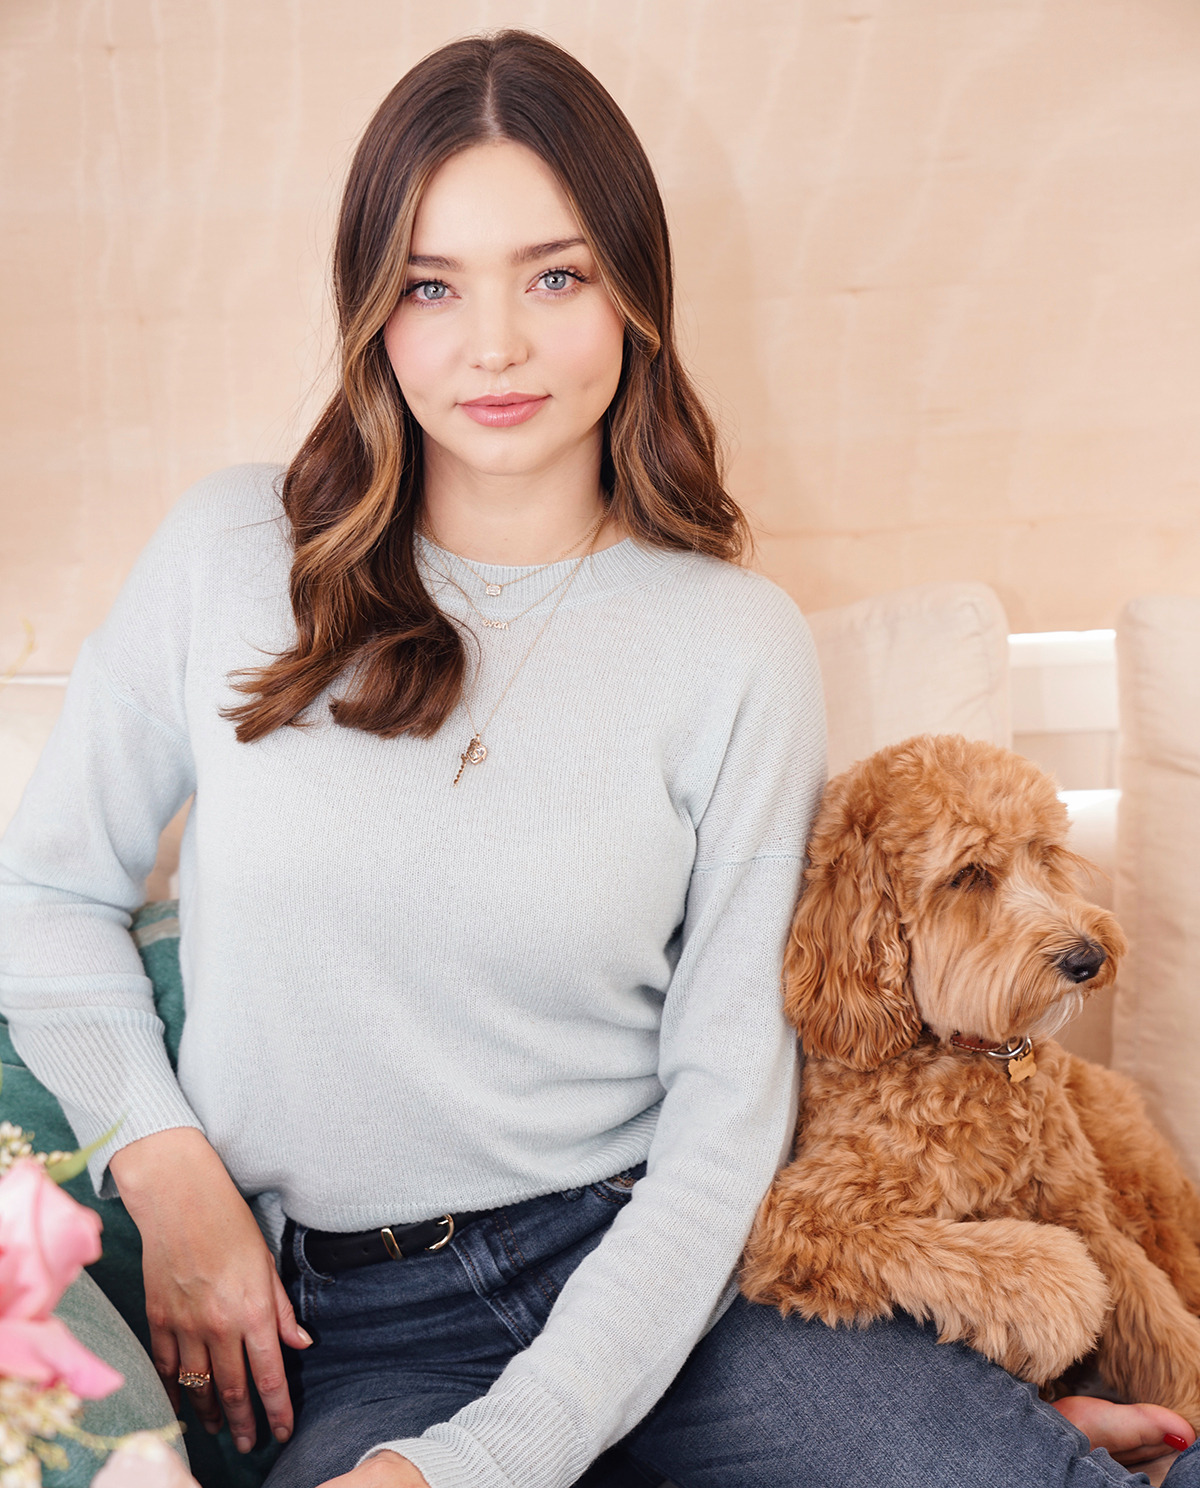 Miranda Kerr with her dog Teddy